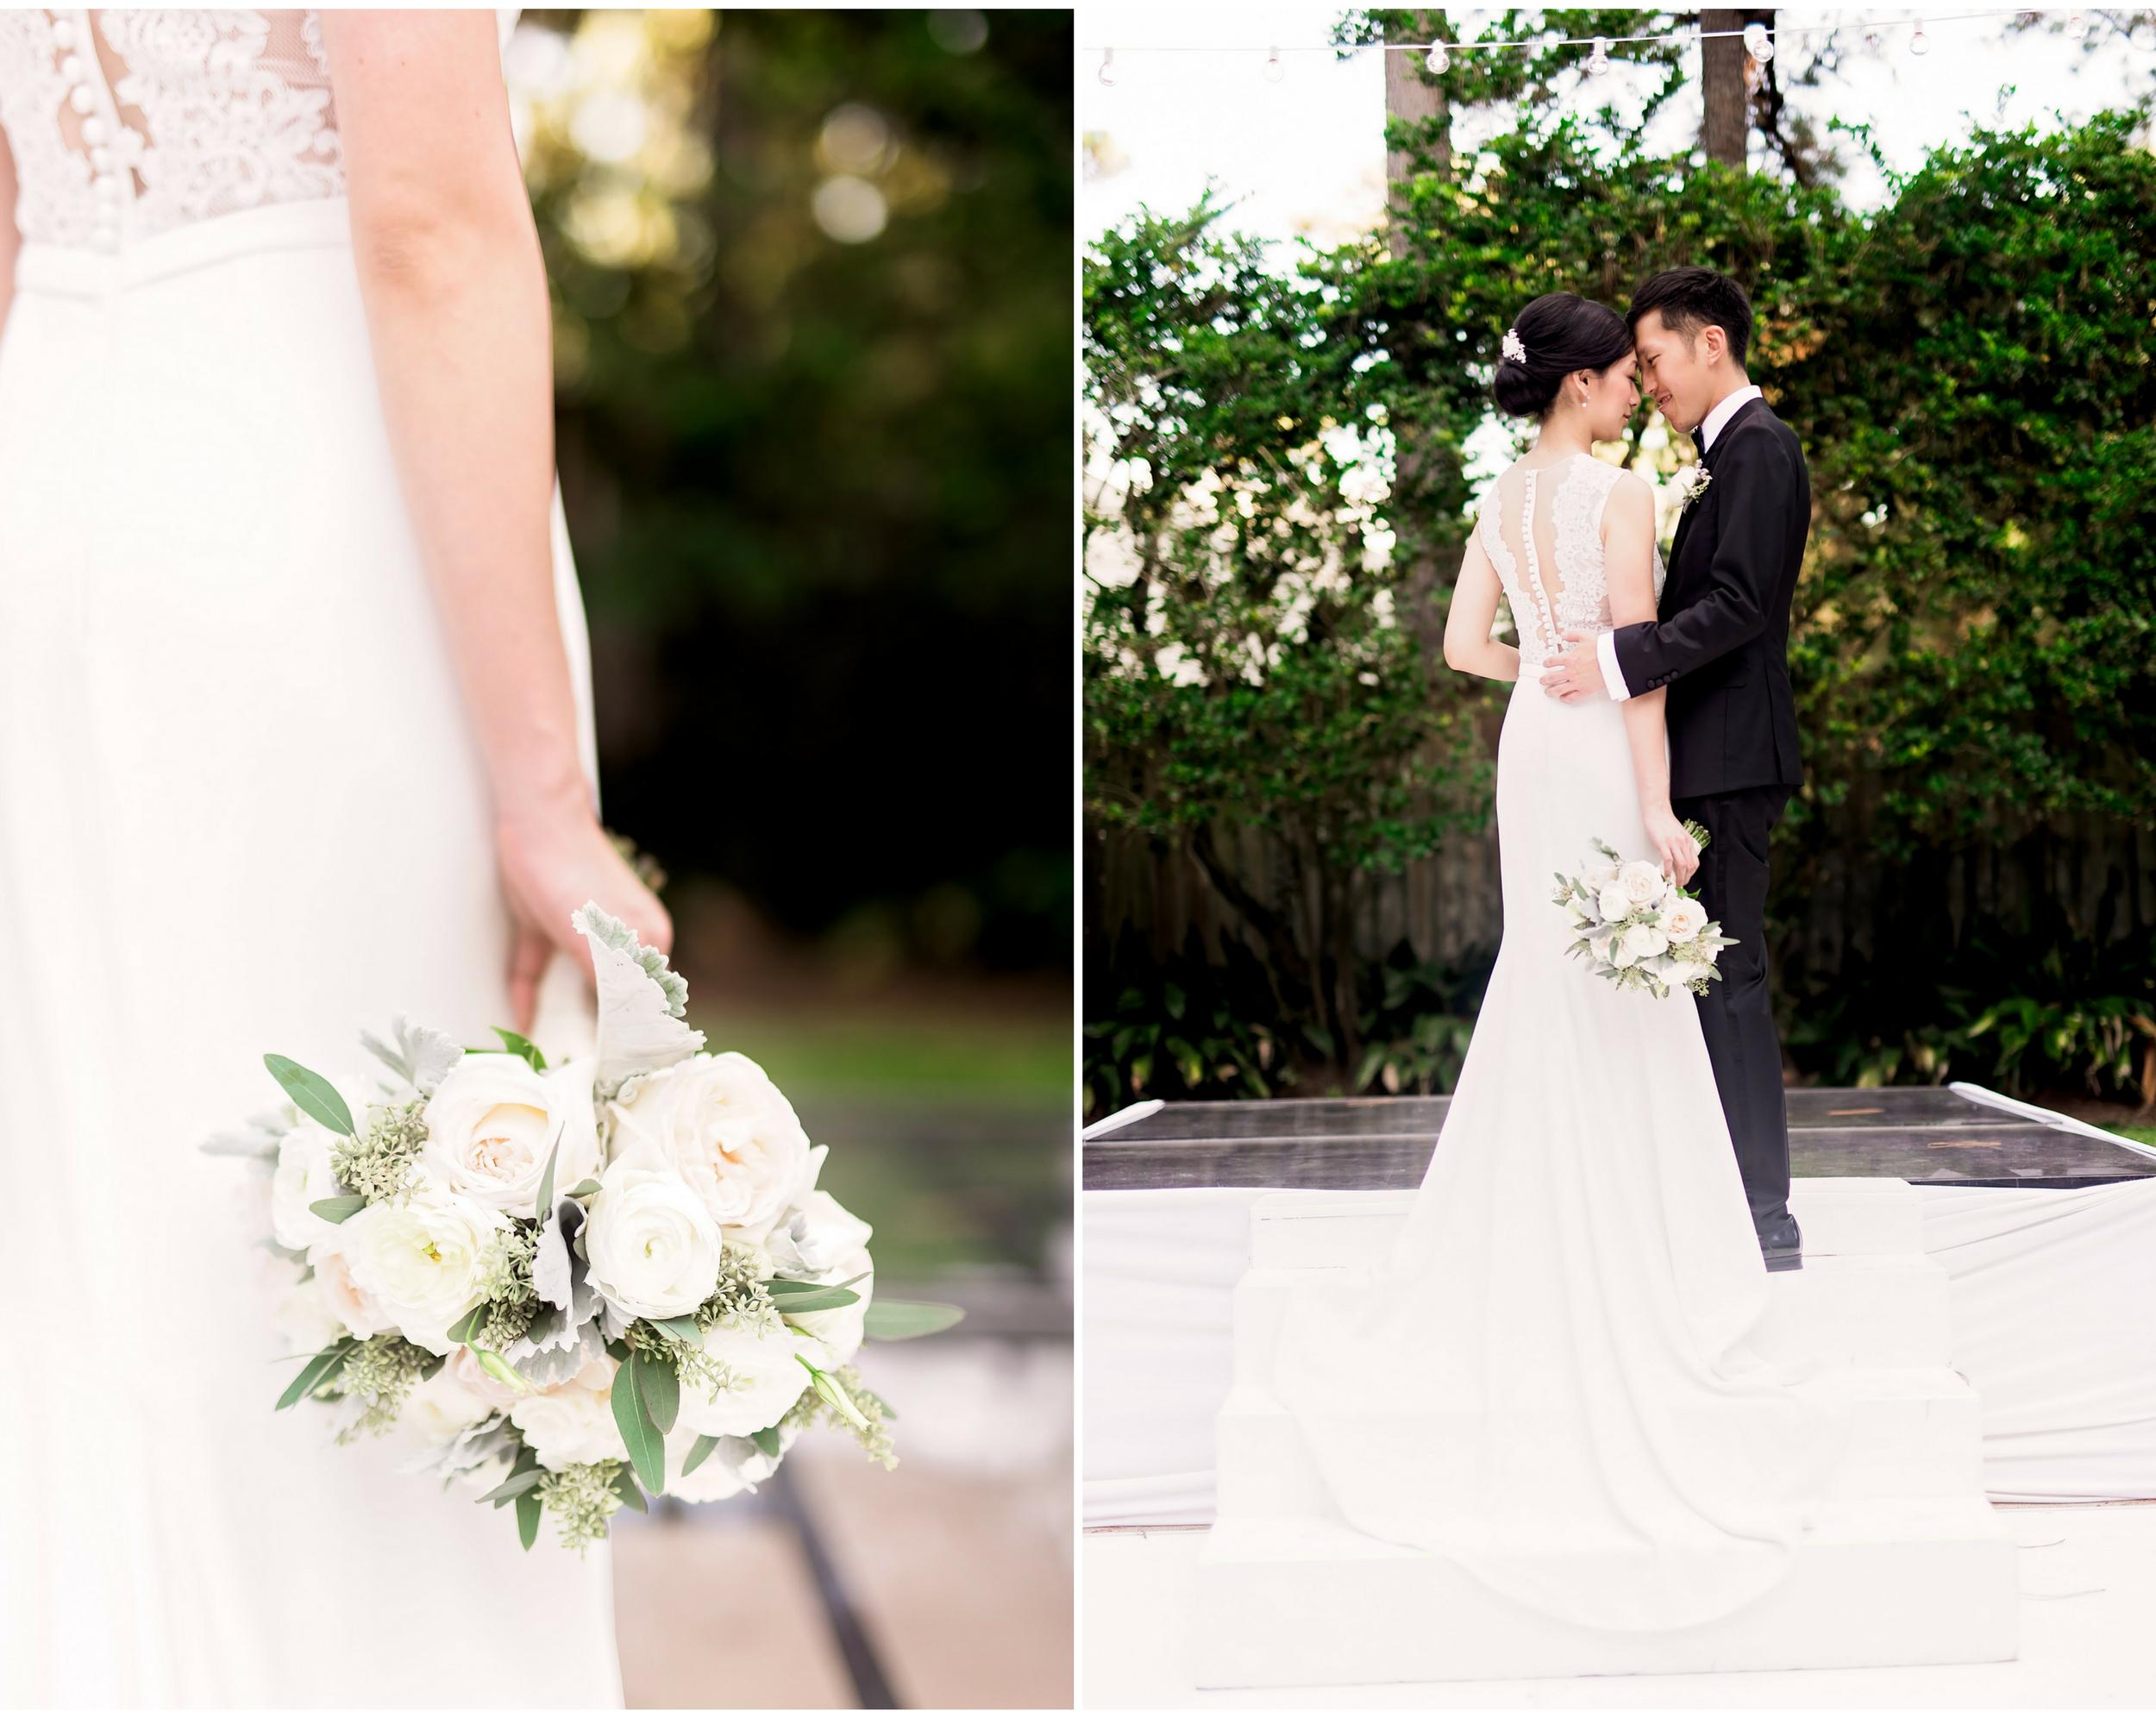 Cathleen-Jeha-Real-Wedding-Pharris-Photography3.png